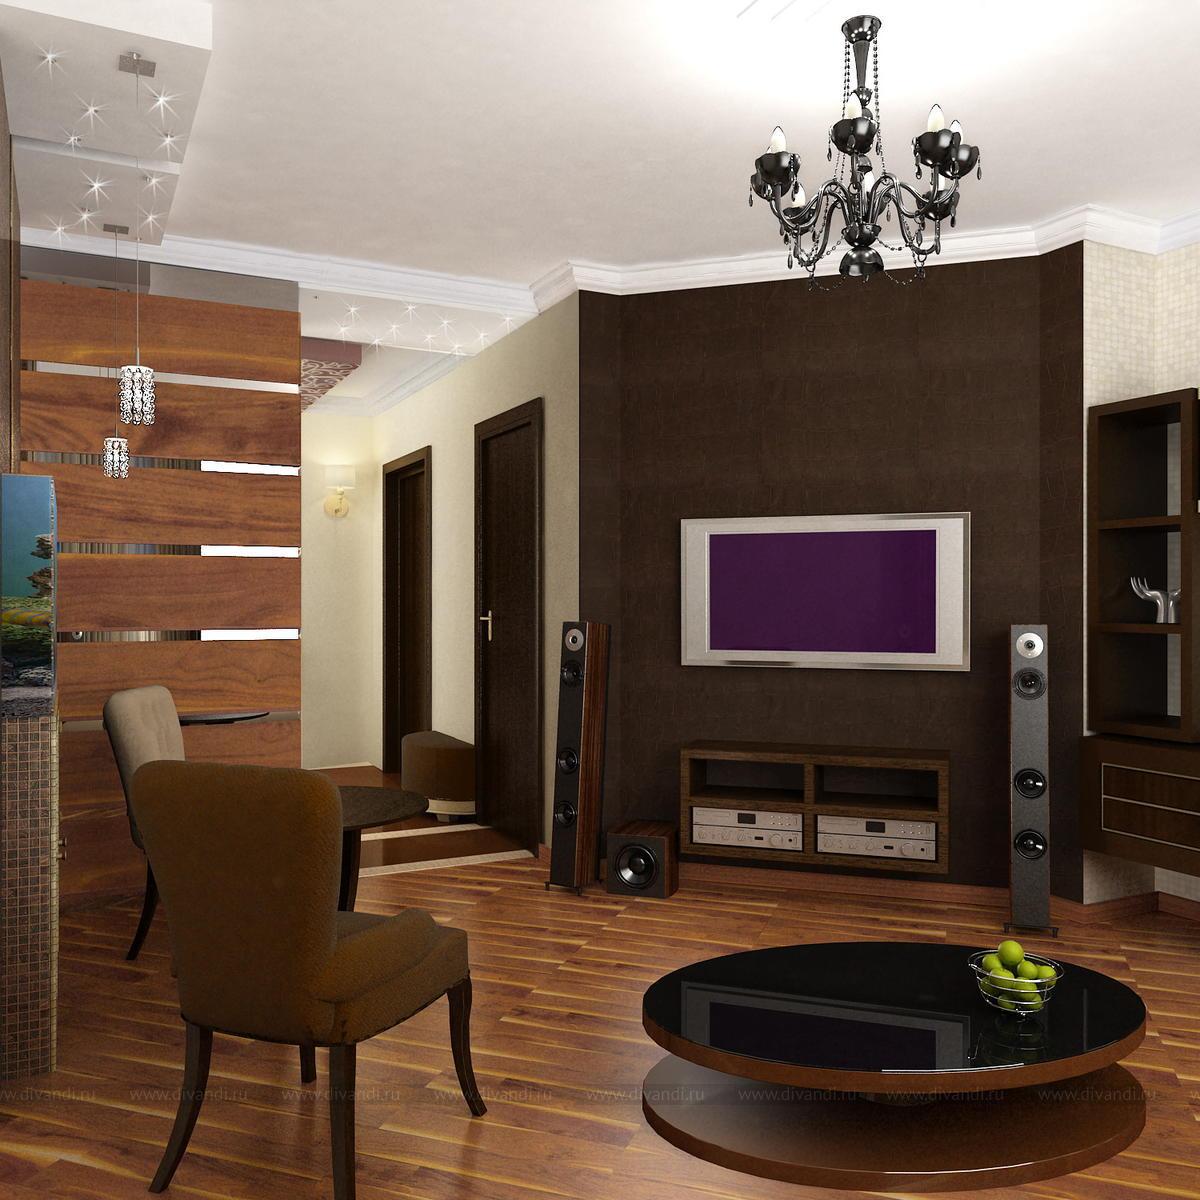 Дизайн квартир ип 46с